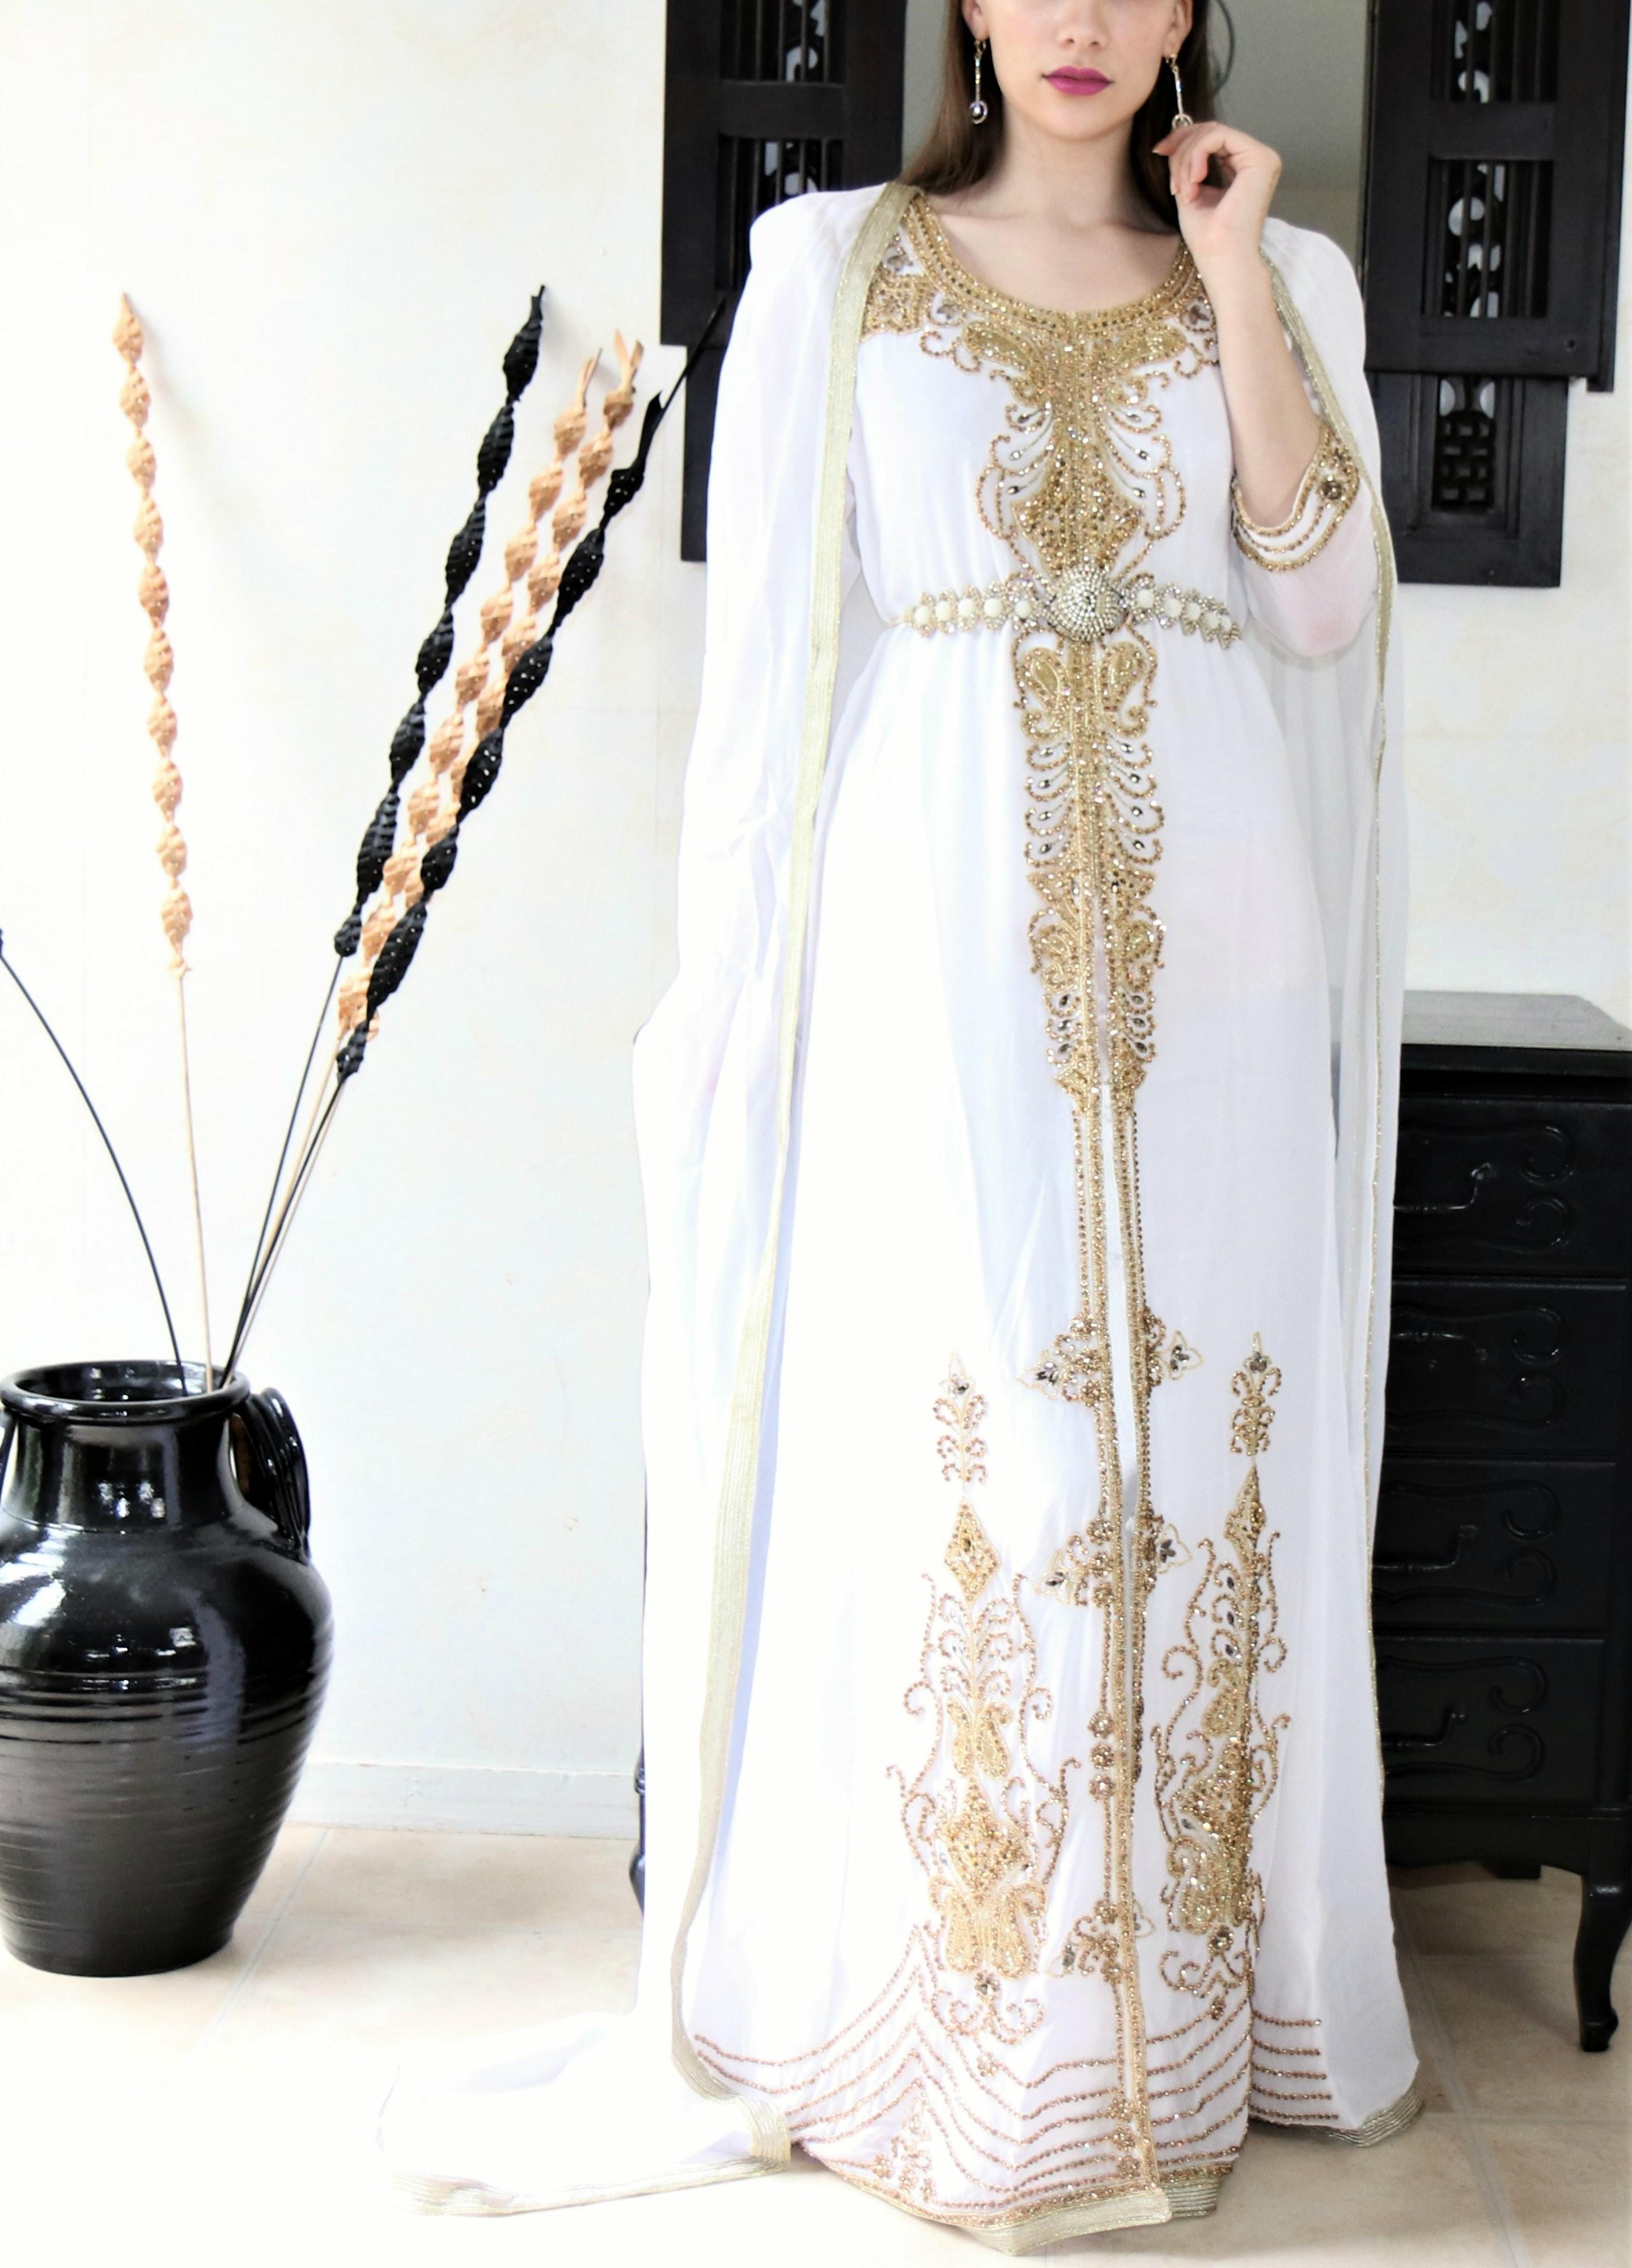 Robe orientale mariage blanche et or - aniiqa.